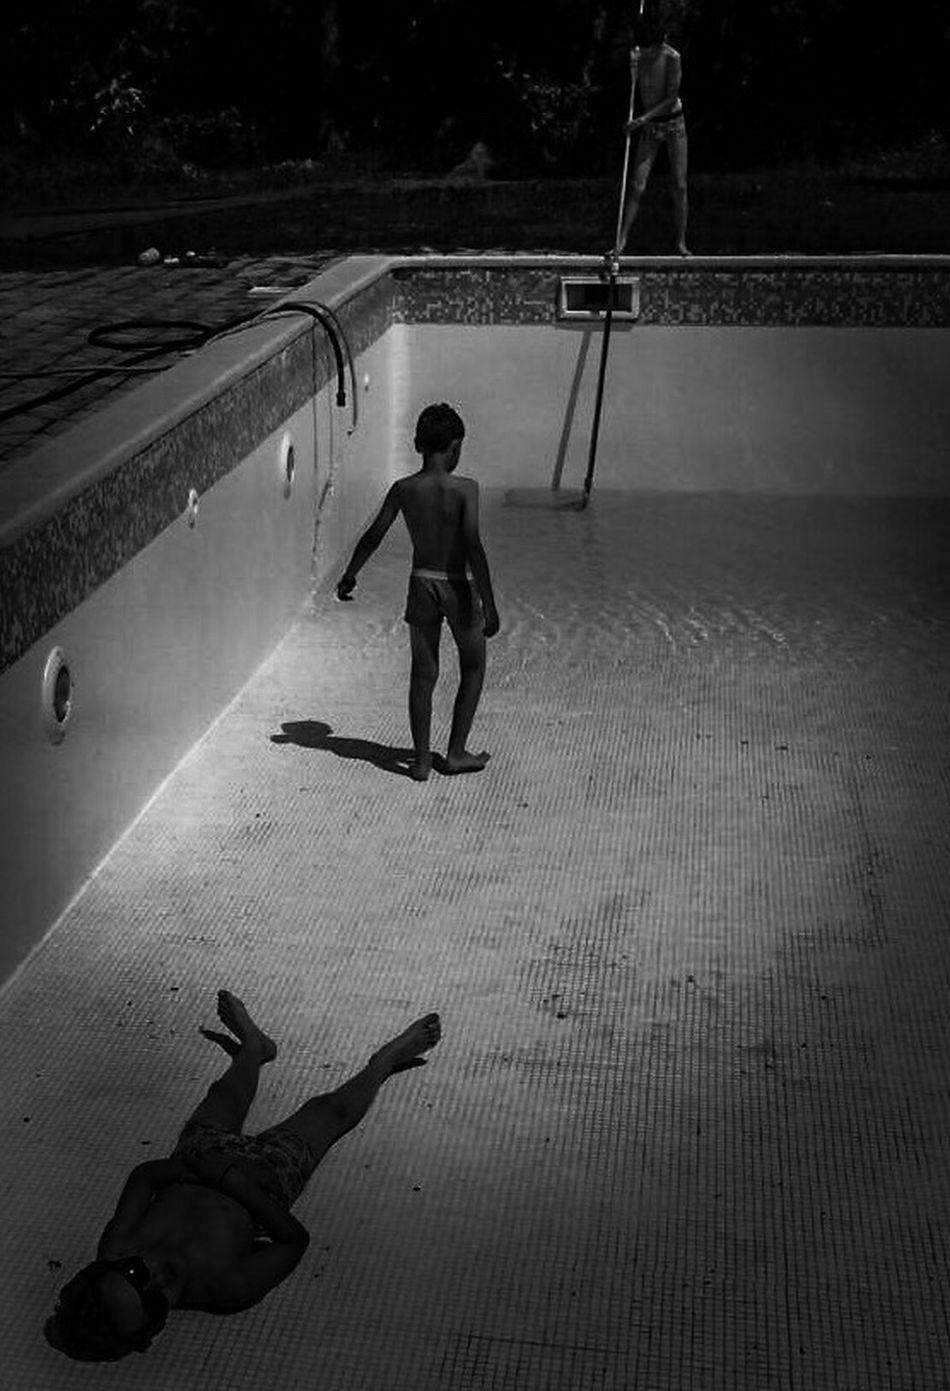 Swimming Pool Empty Places EyeEm Best Shots Black And White Photography Noir Et Blanc Enjoying Life Swimingpool Water Joke Kids Having Fun Outdoors Nettoyage De Printemps Préparer L'ete Showcase March